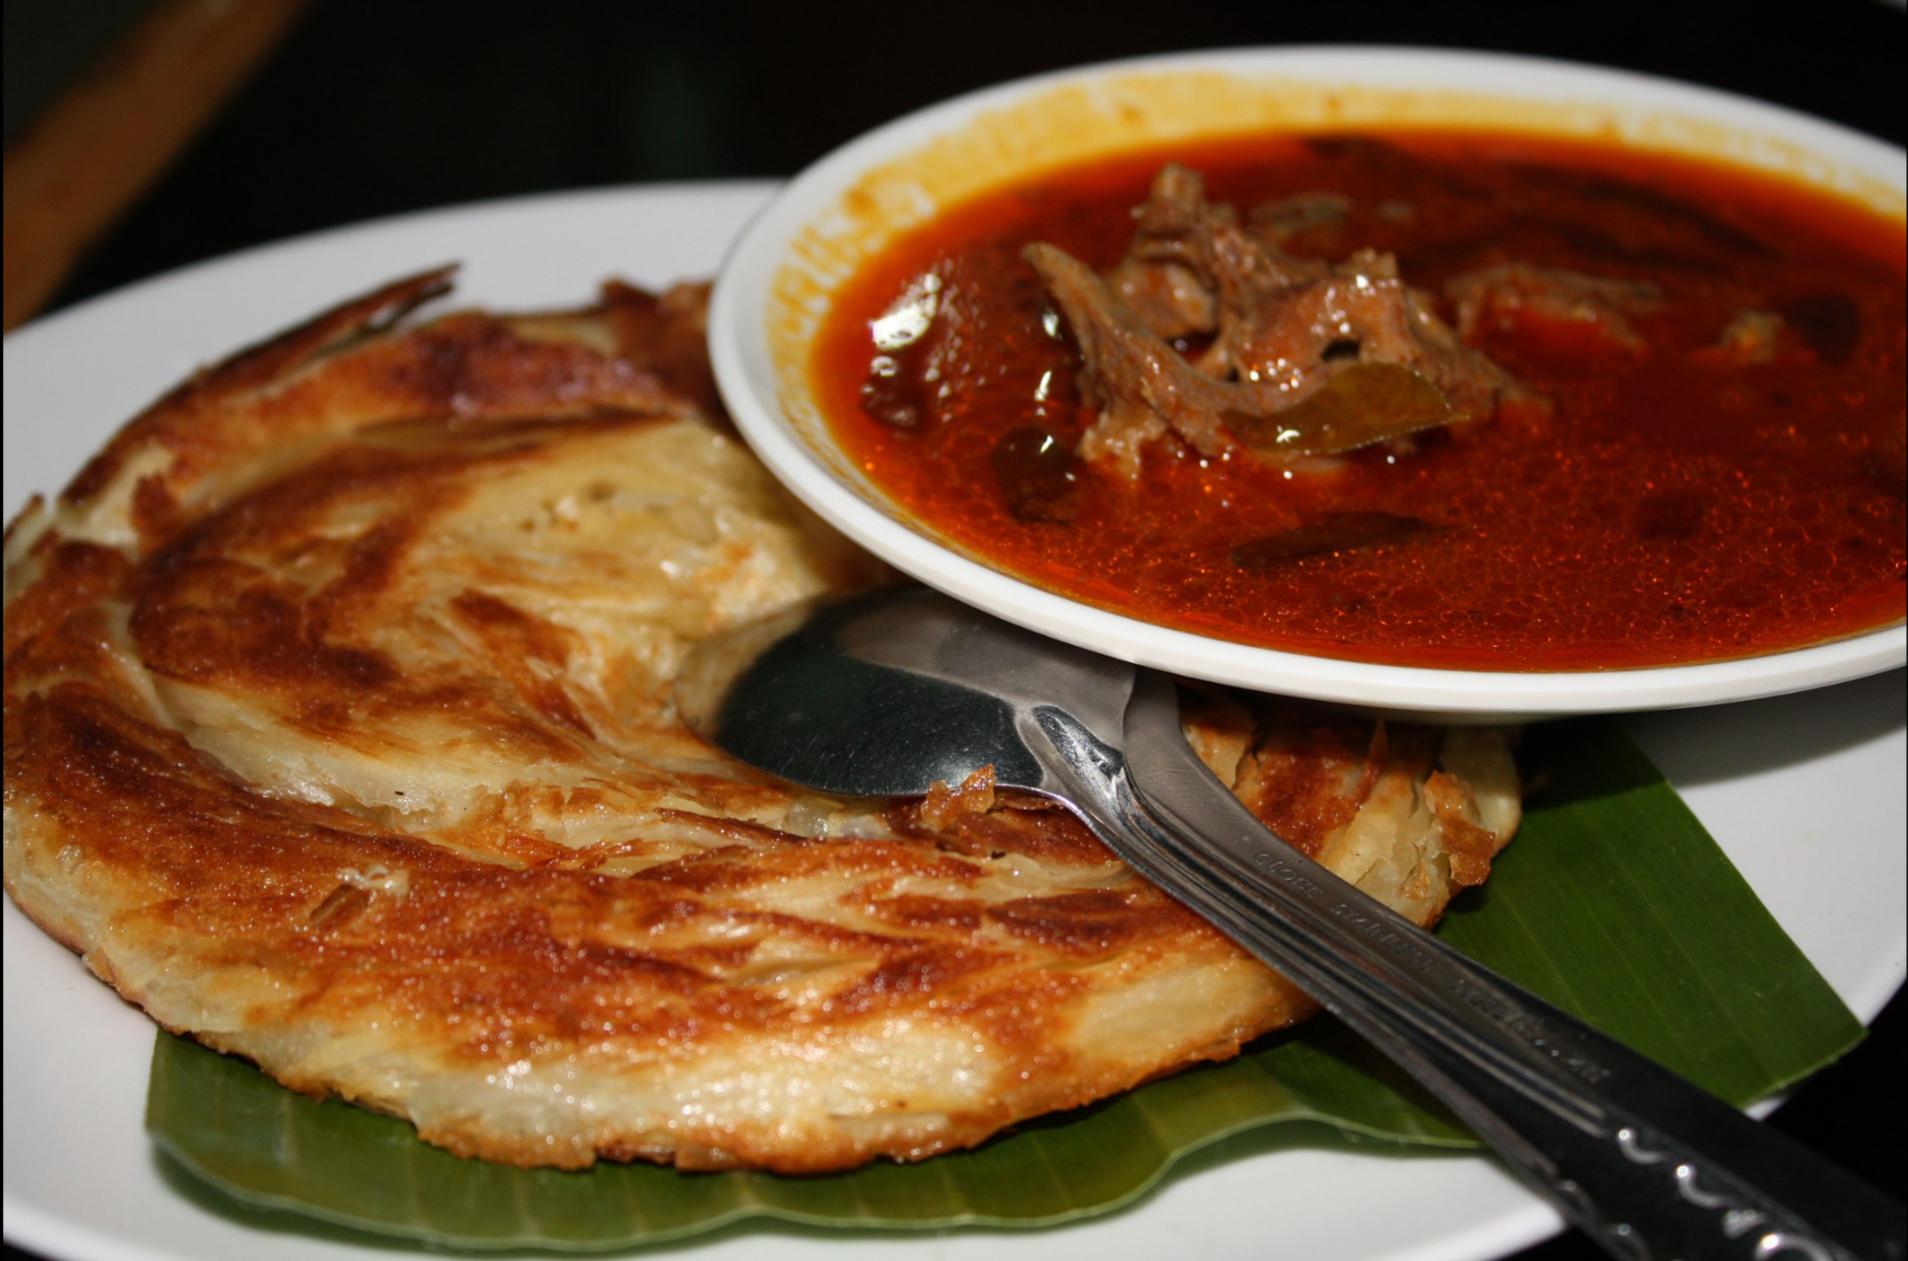 Kari kambing (mutton curry) served with roti canai in Sumatra.